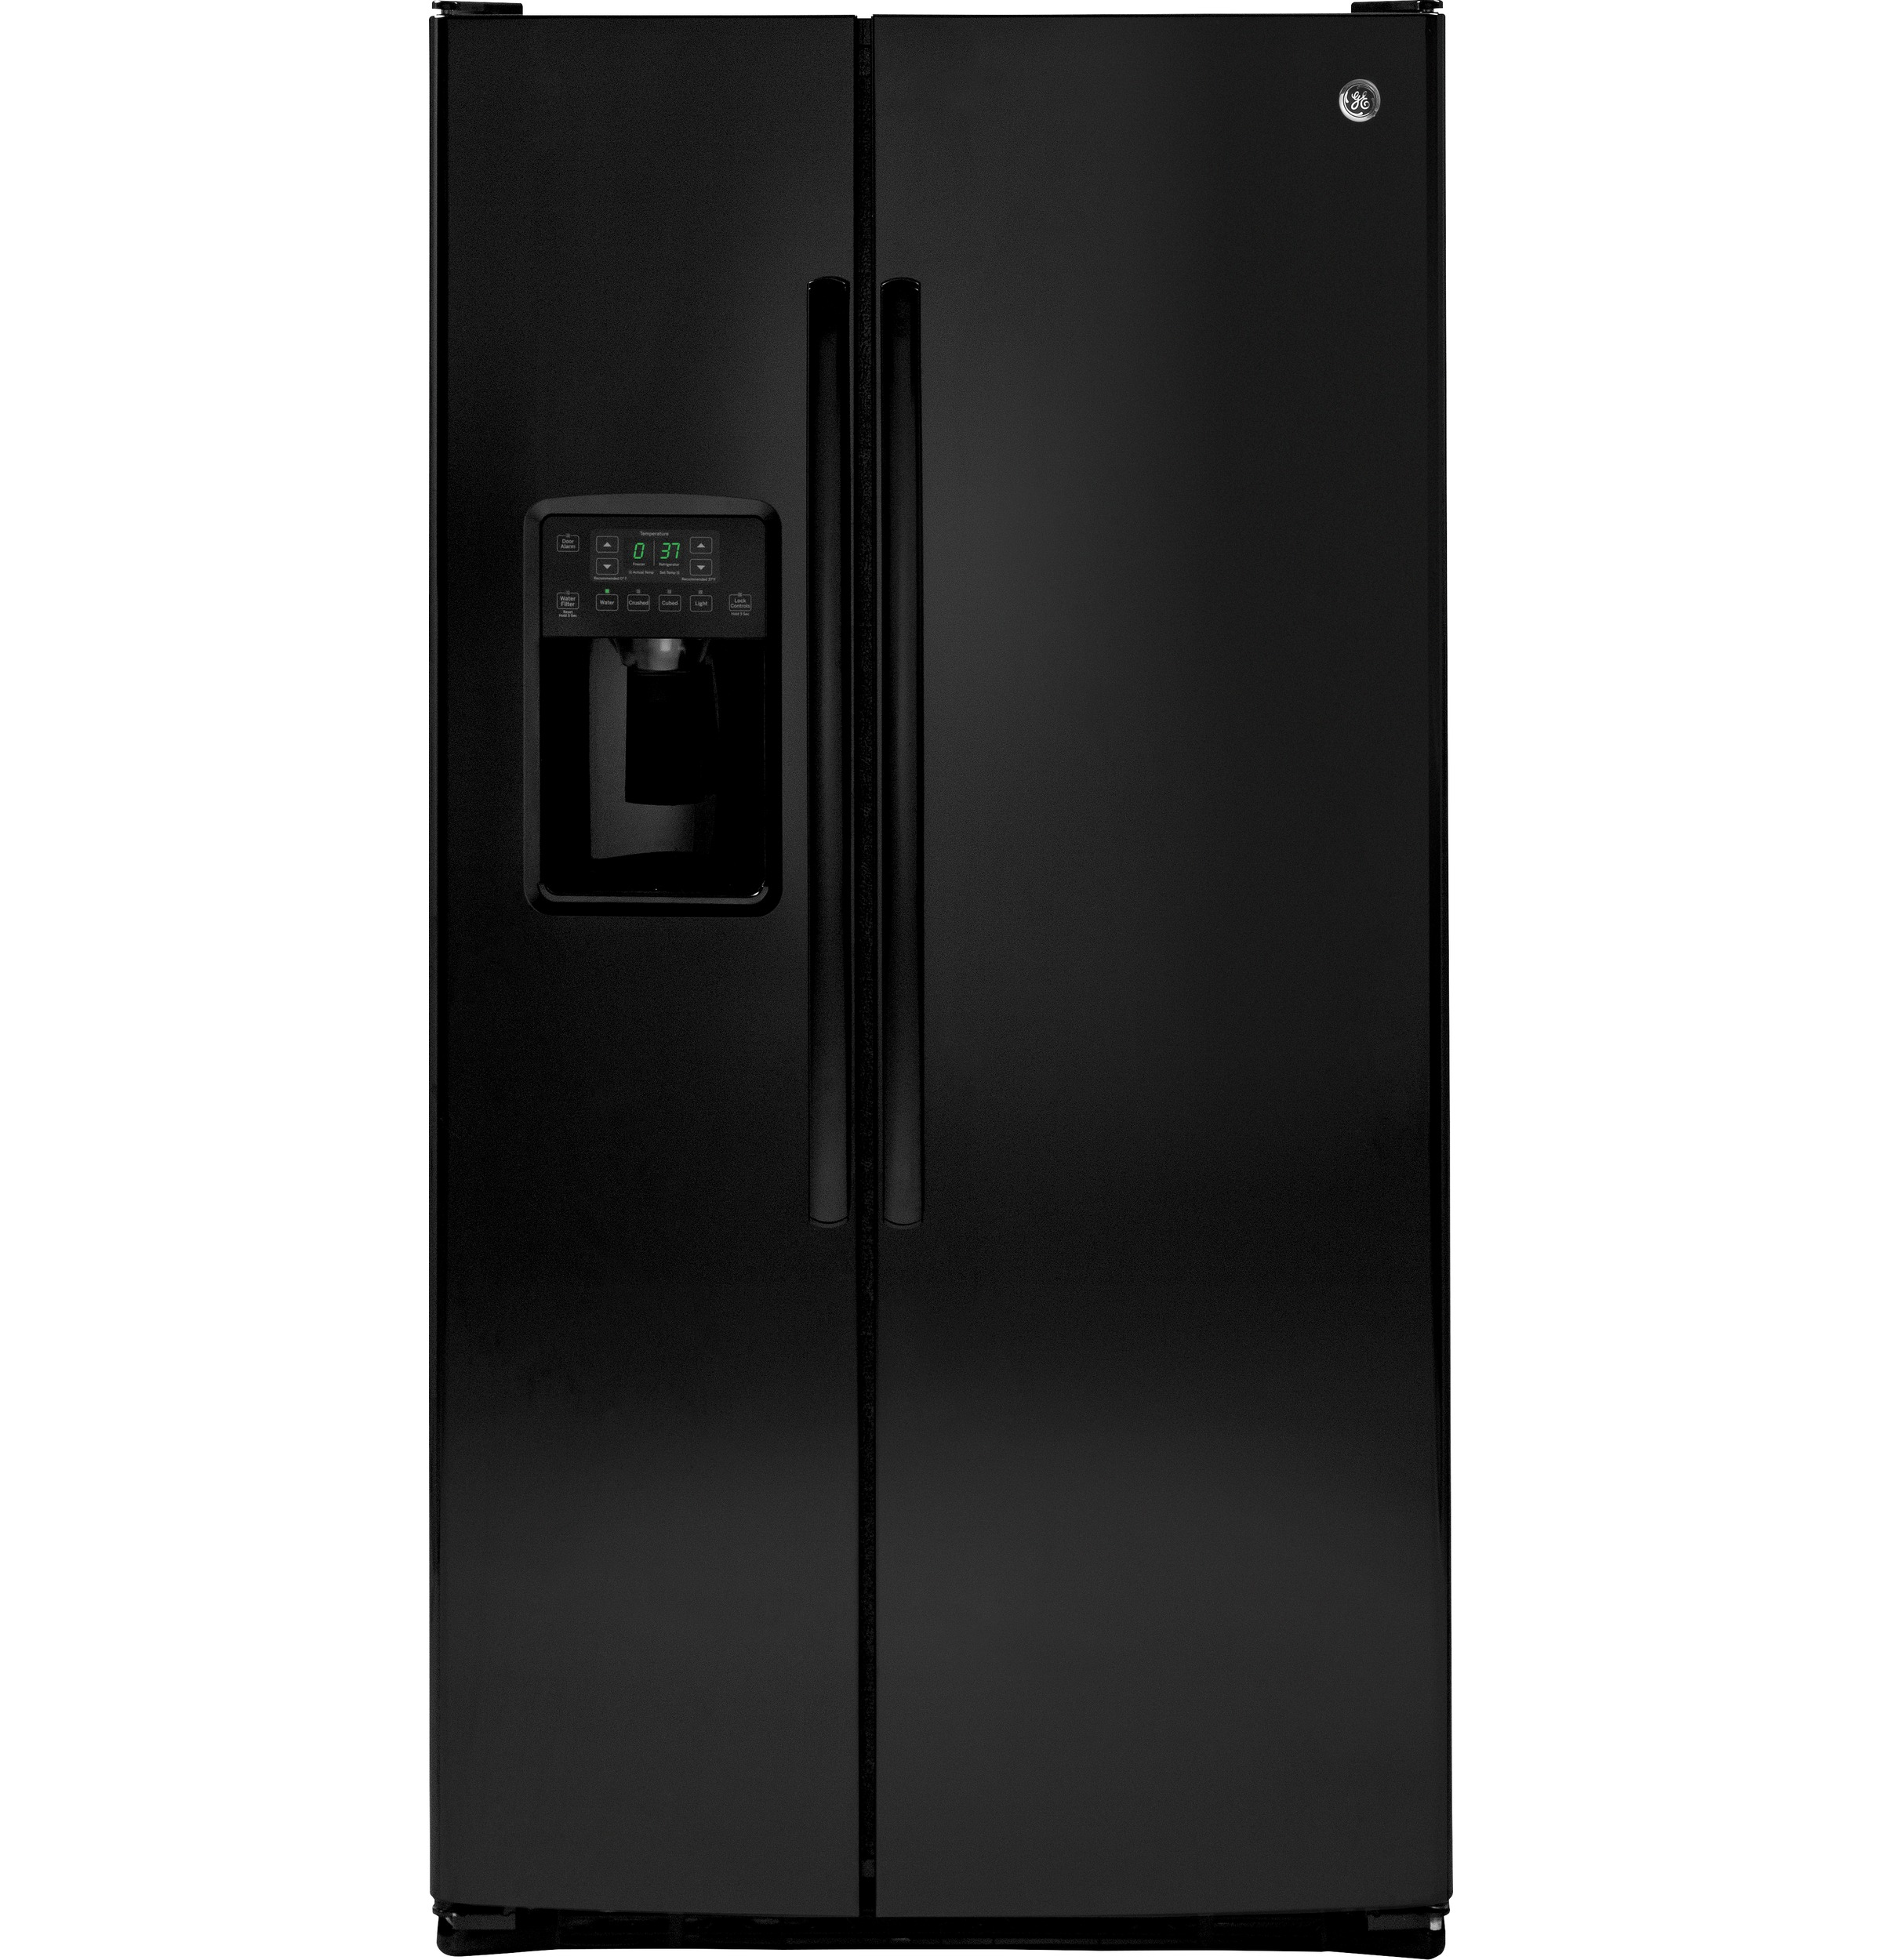 GE GE® ENERGY STAR® 25.3 Cu. Ft. Side-By-Side Refrigerator